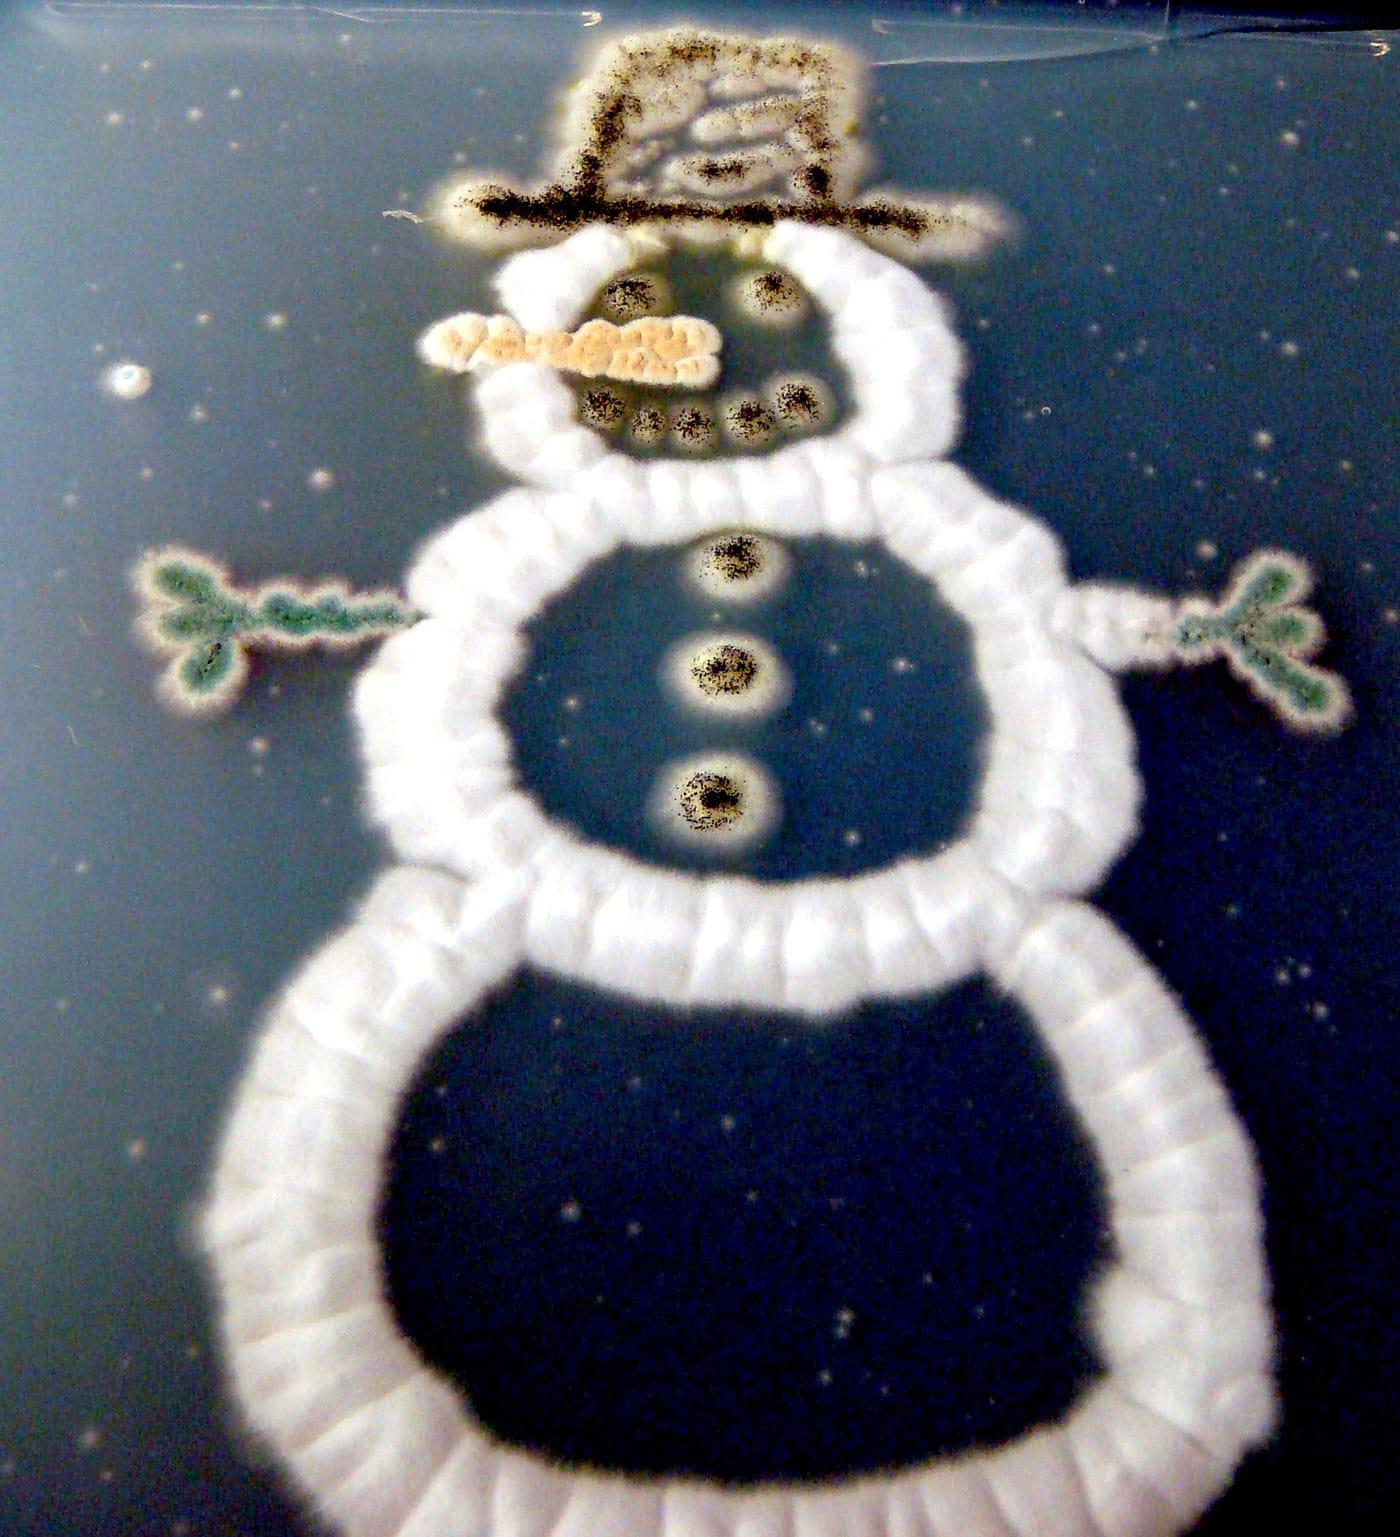 snowman-created-in-petri-dish